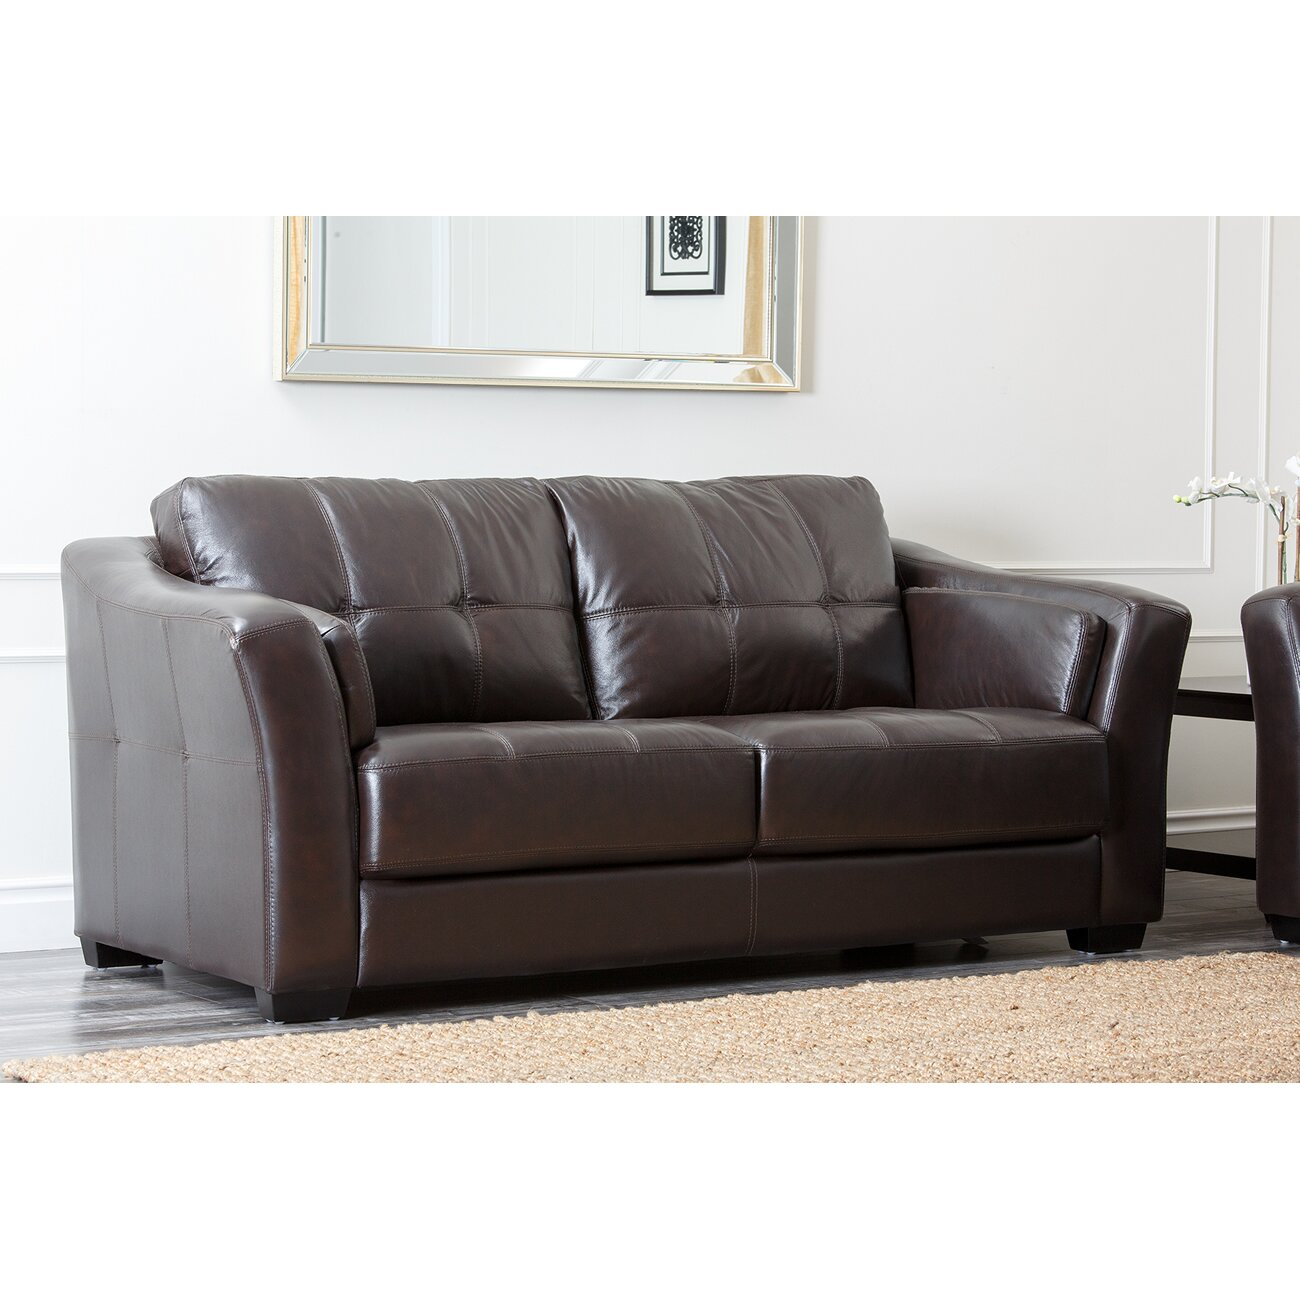 Leather Sofa Sydney